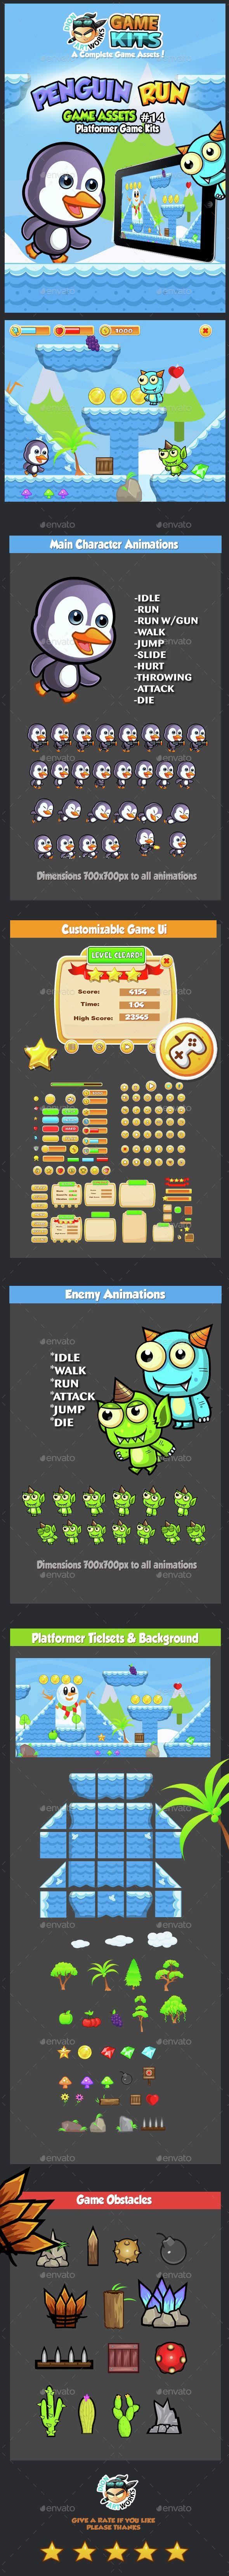 Penguin Run Platformer Game Assets 14 - #Game Kits Game #Assets Download here: https://graphicriver.net/item/penguin-run-platformer-game-assets-14/14778448?ref=alena994